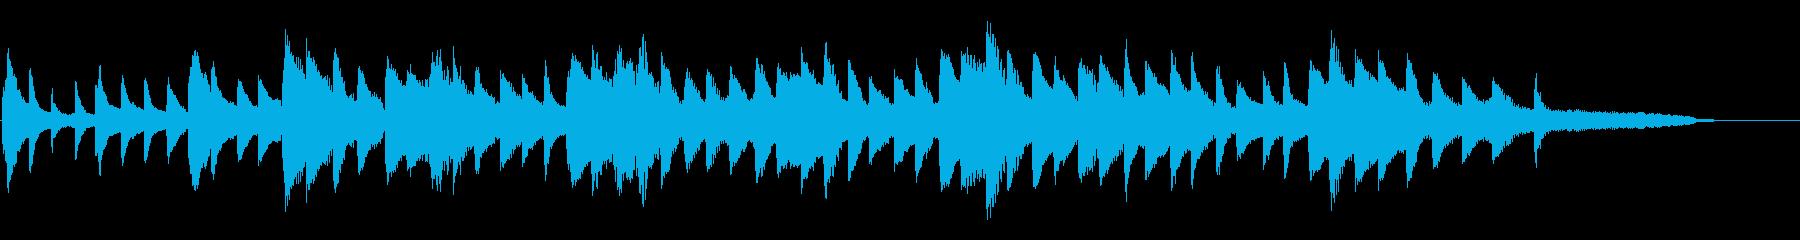 Cinematic Piano 13の再生済みの波形